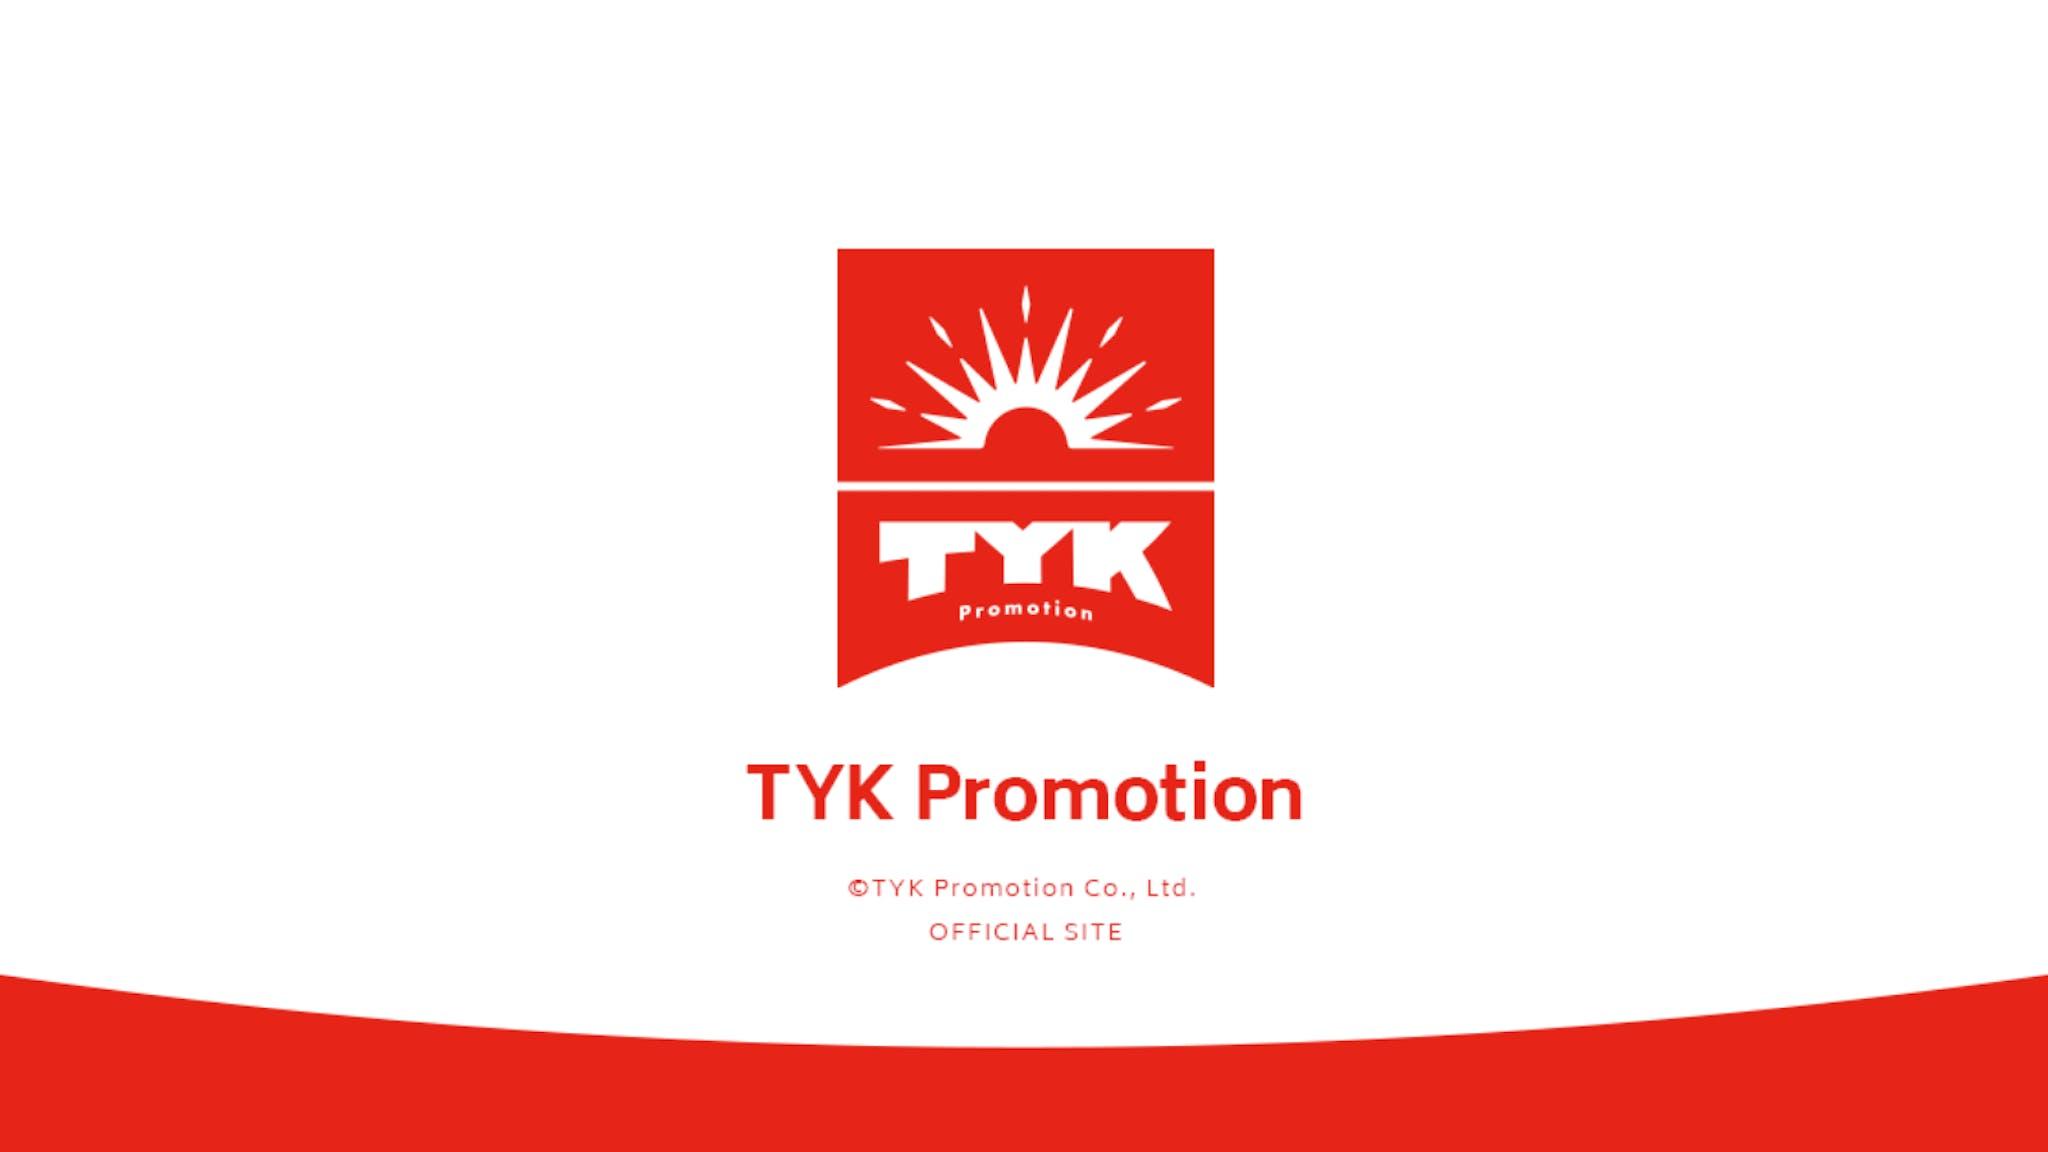 TYK Promotionさま/企業サイト